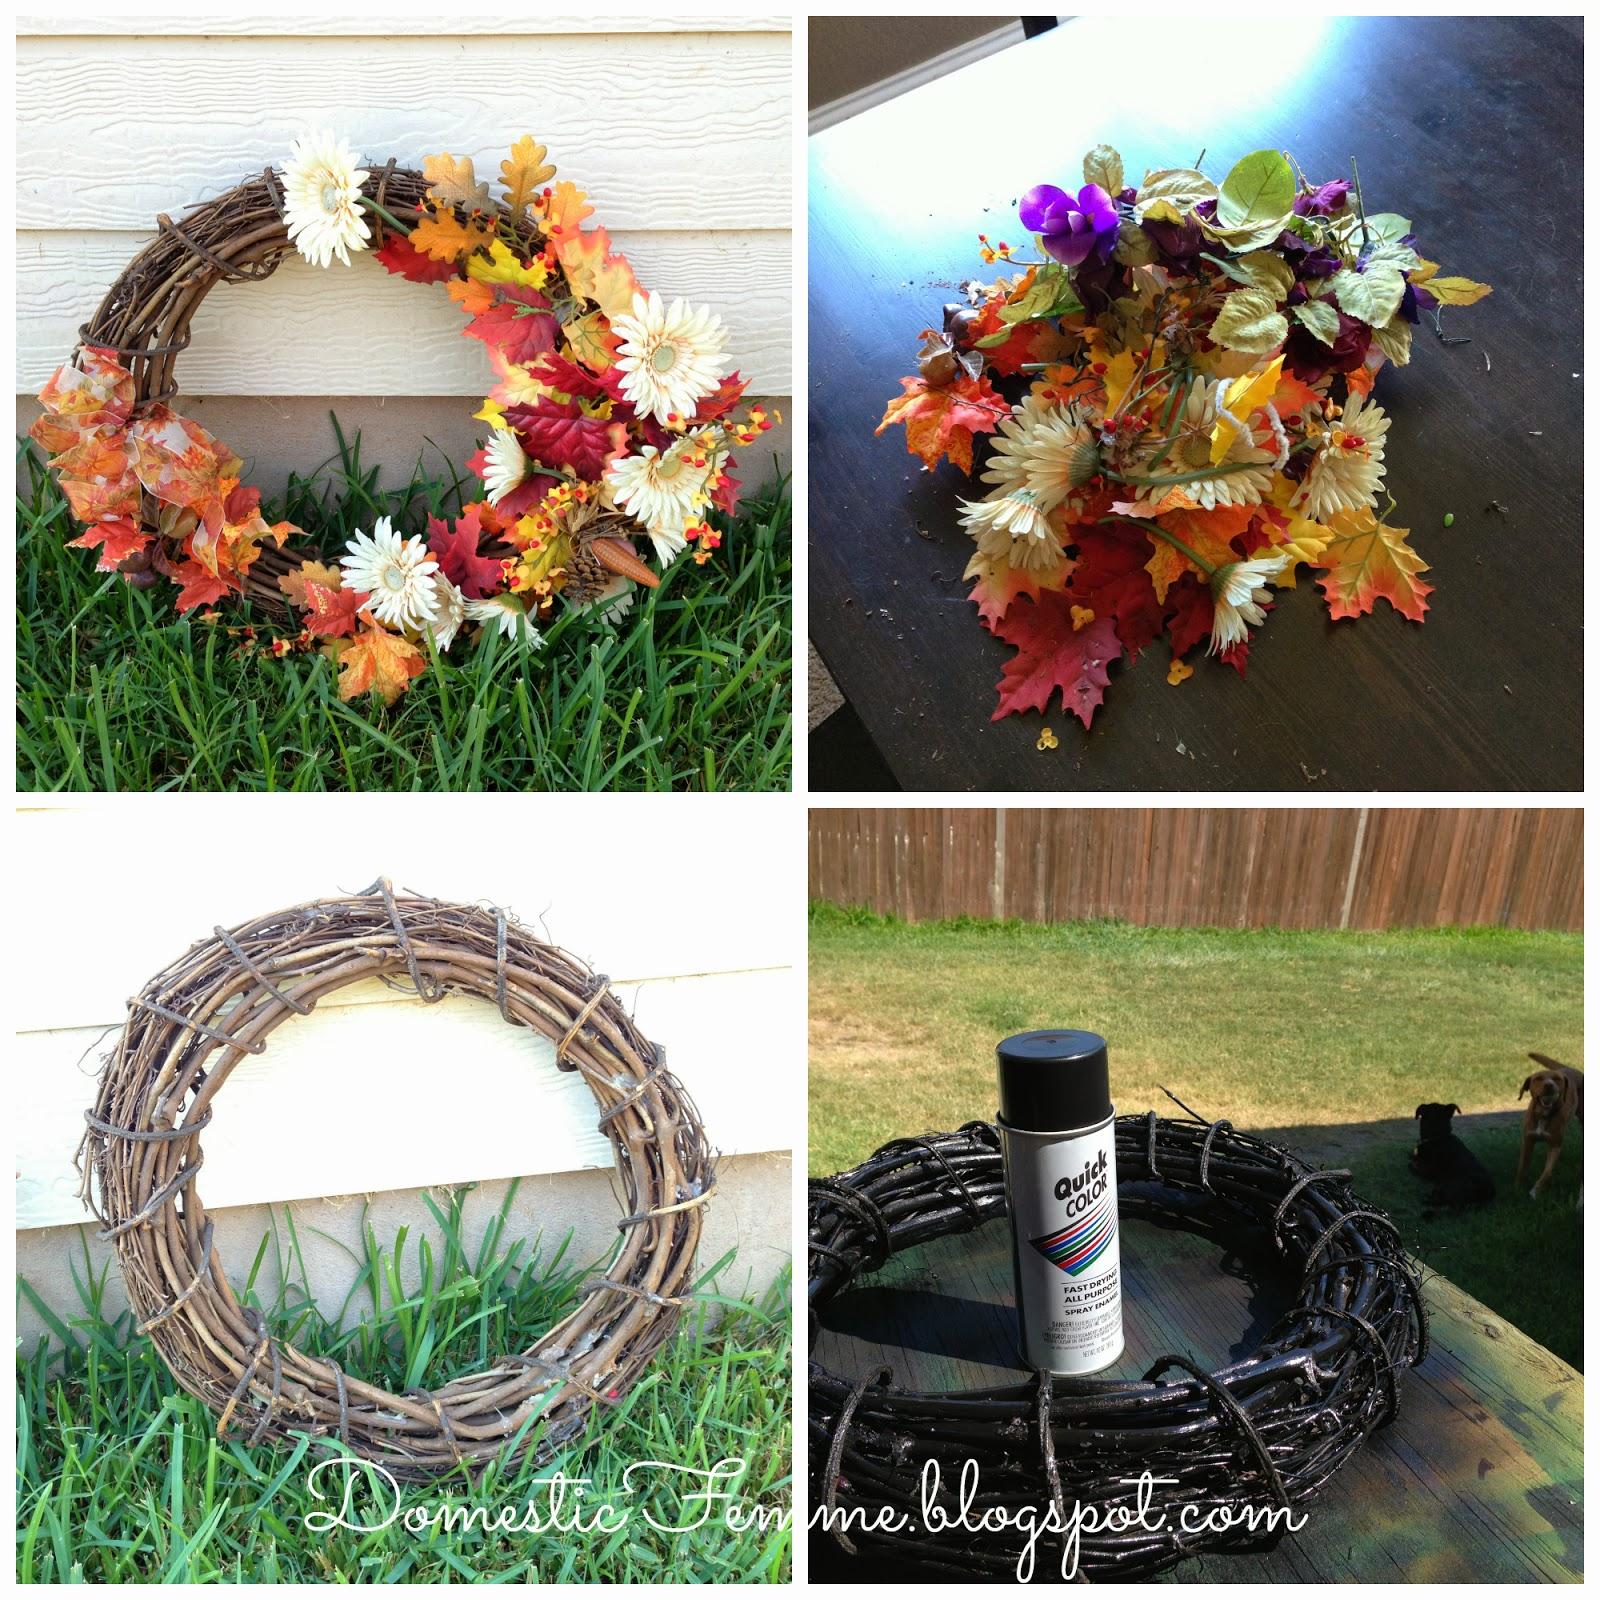 Diy winter wreaths for front door - Diy Foam Monogram Wreath For Less Domestic Femme Wreaths Stepbystep Tutorial